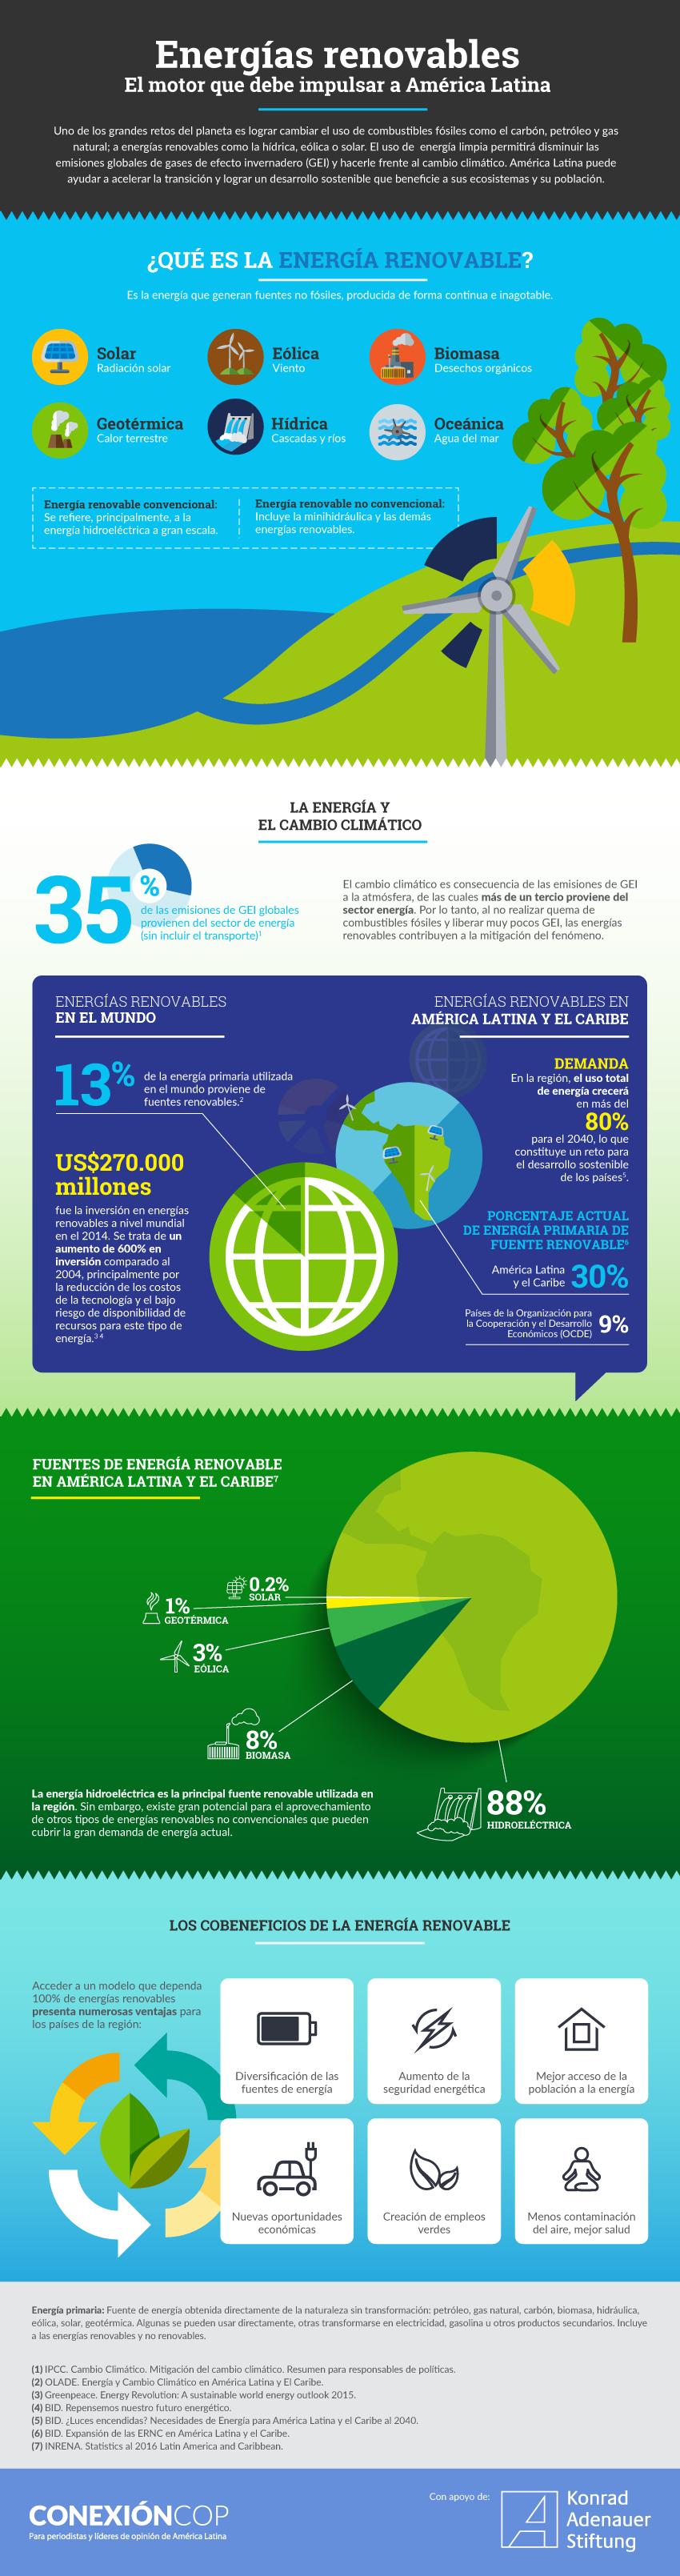 energias_renovables_america_latina_infografia